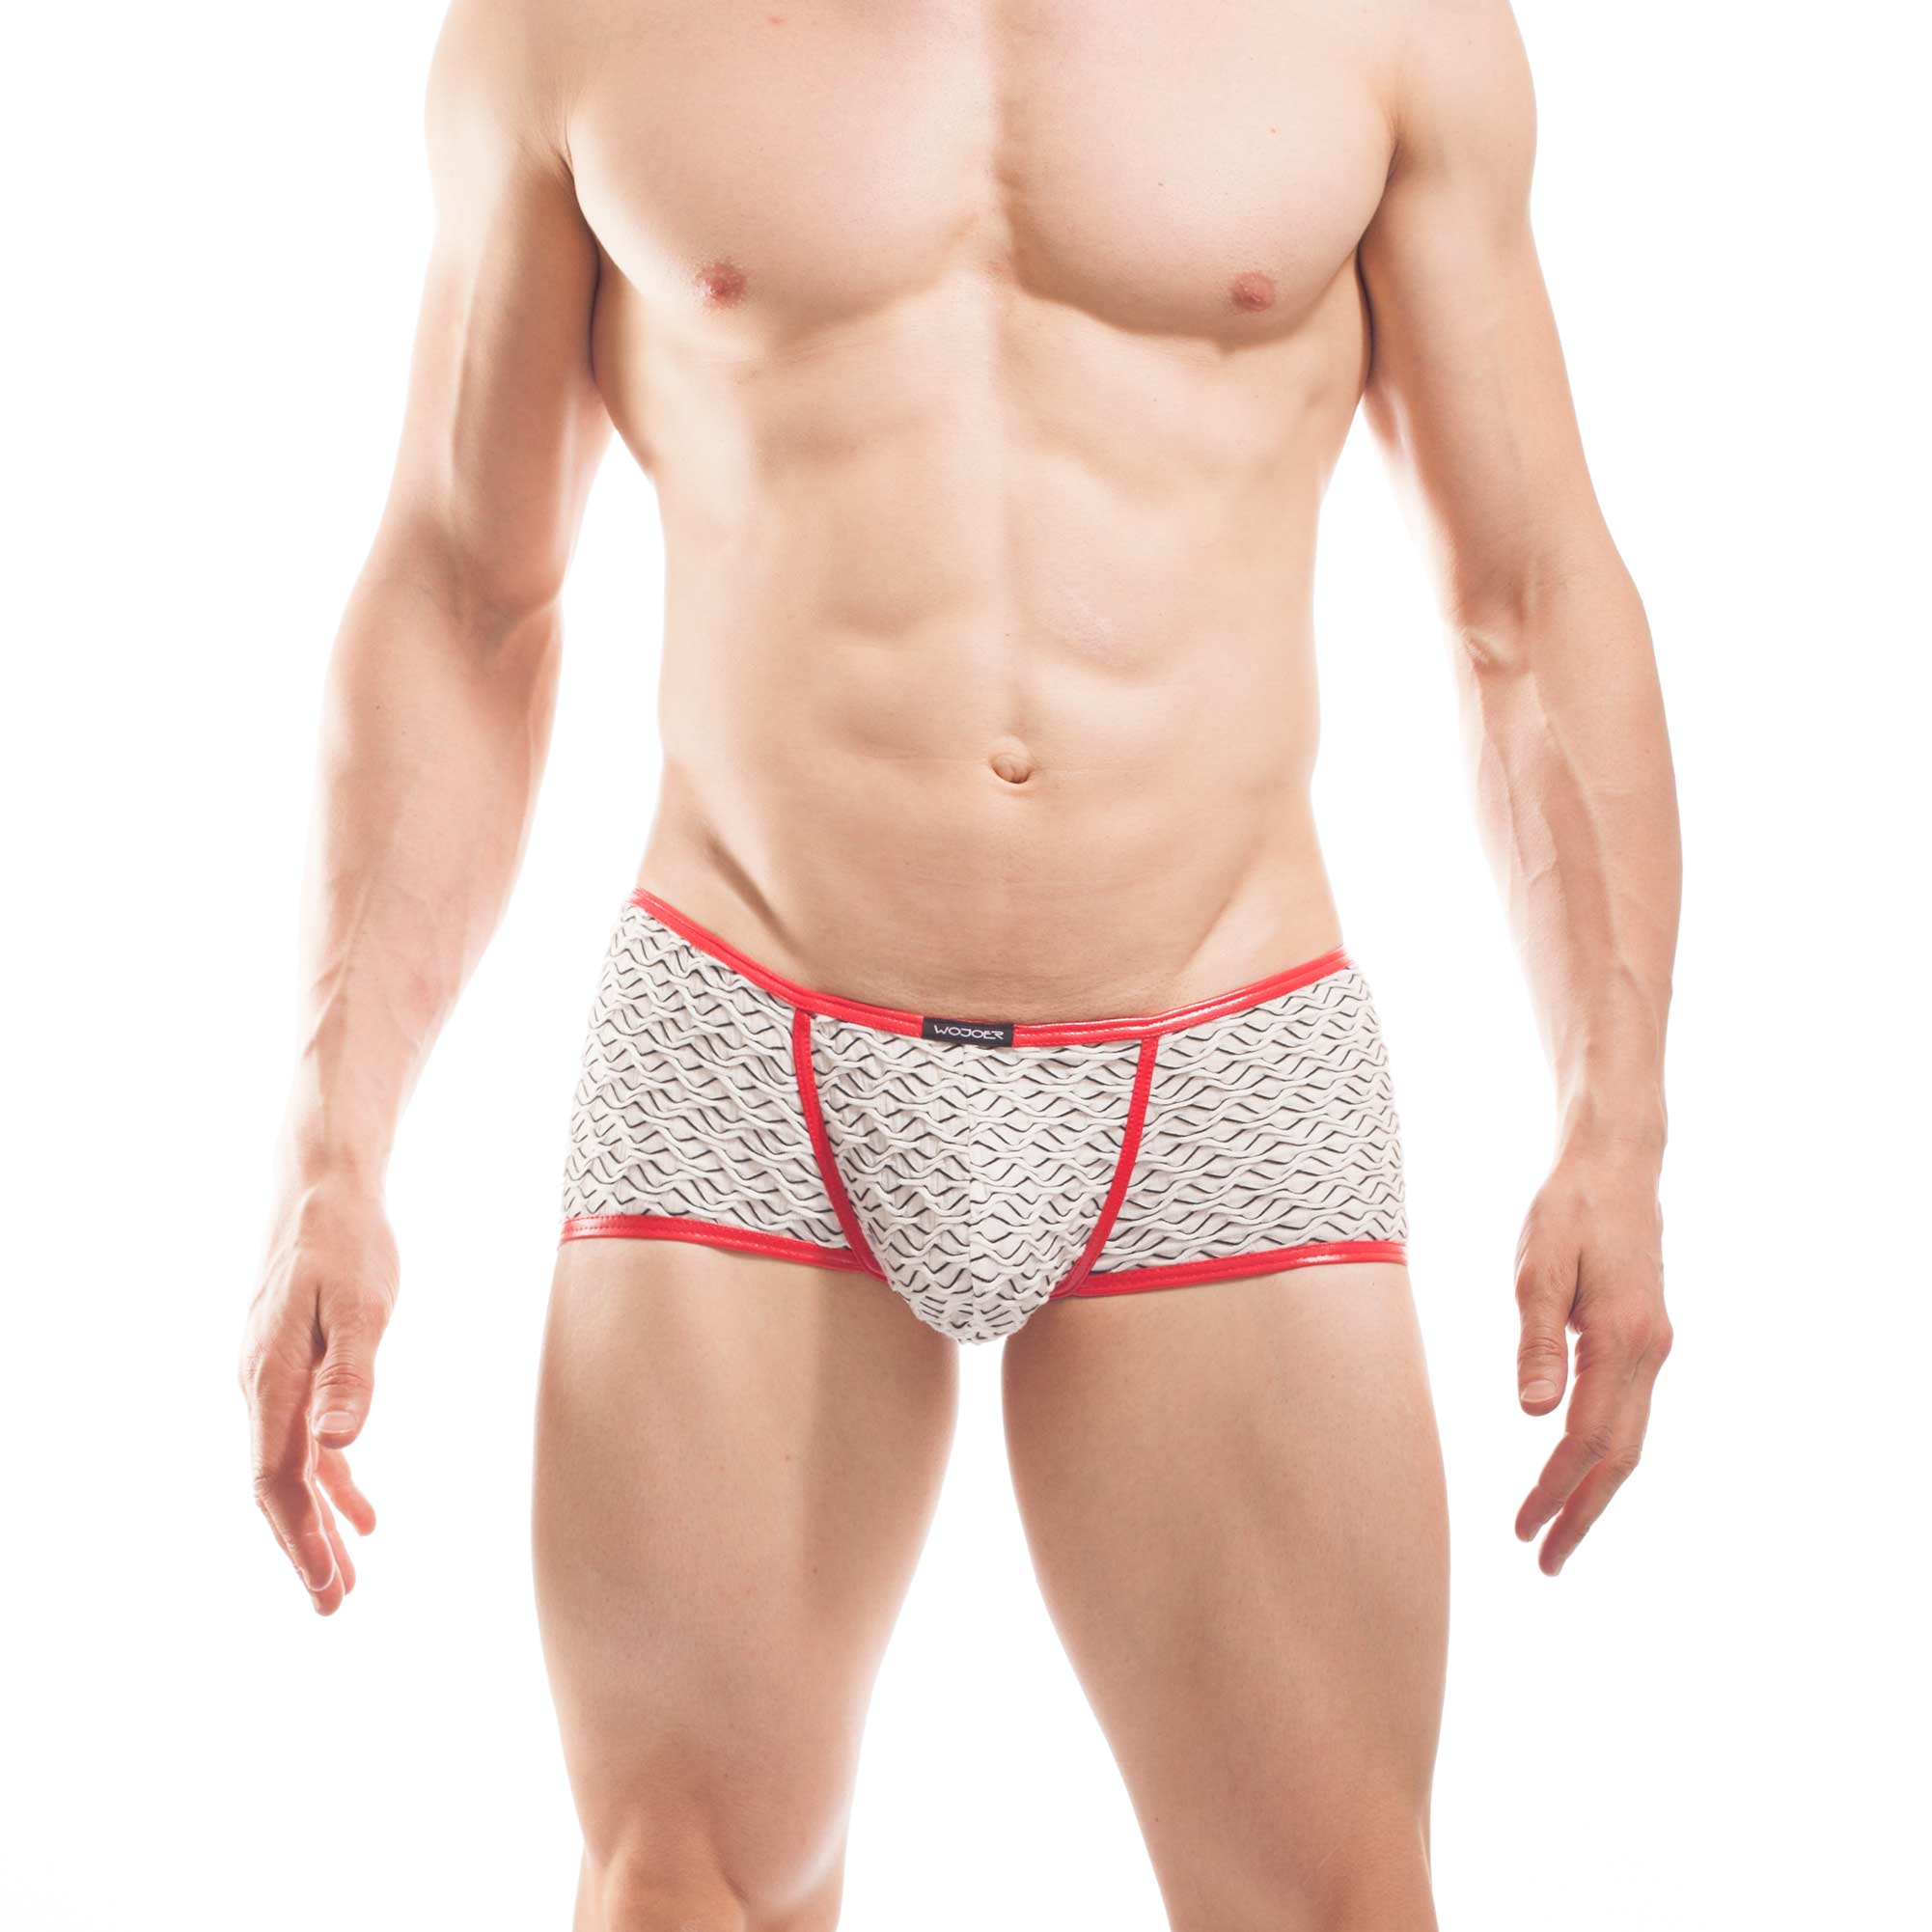 3D struktur pants, white waves, baumwoll Pants, 3D Material, Rippmaterial,